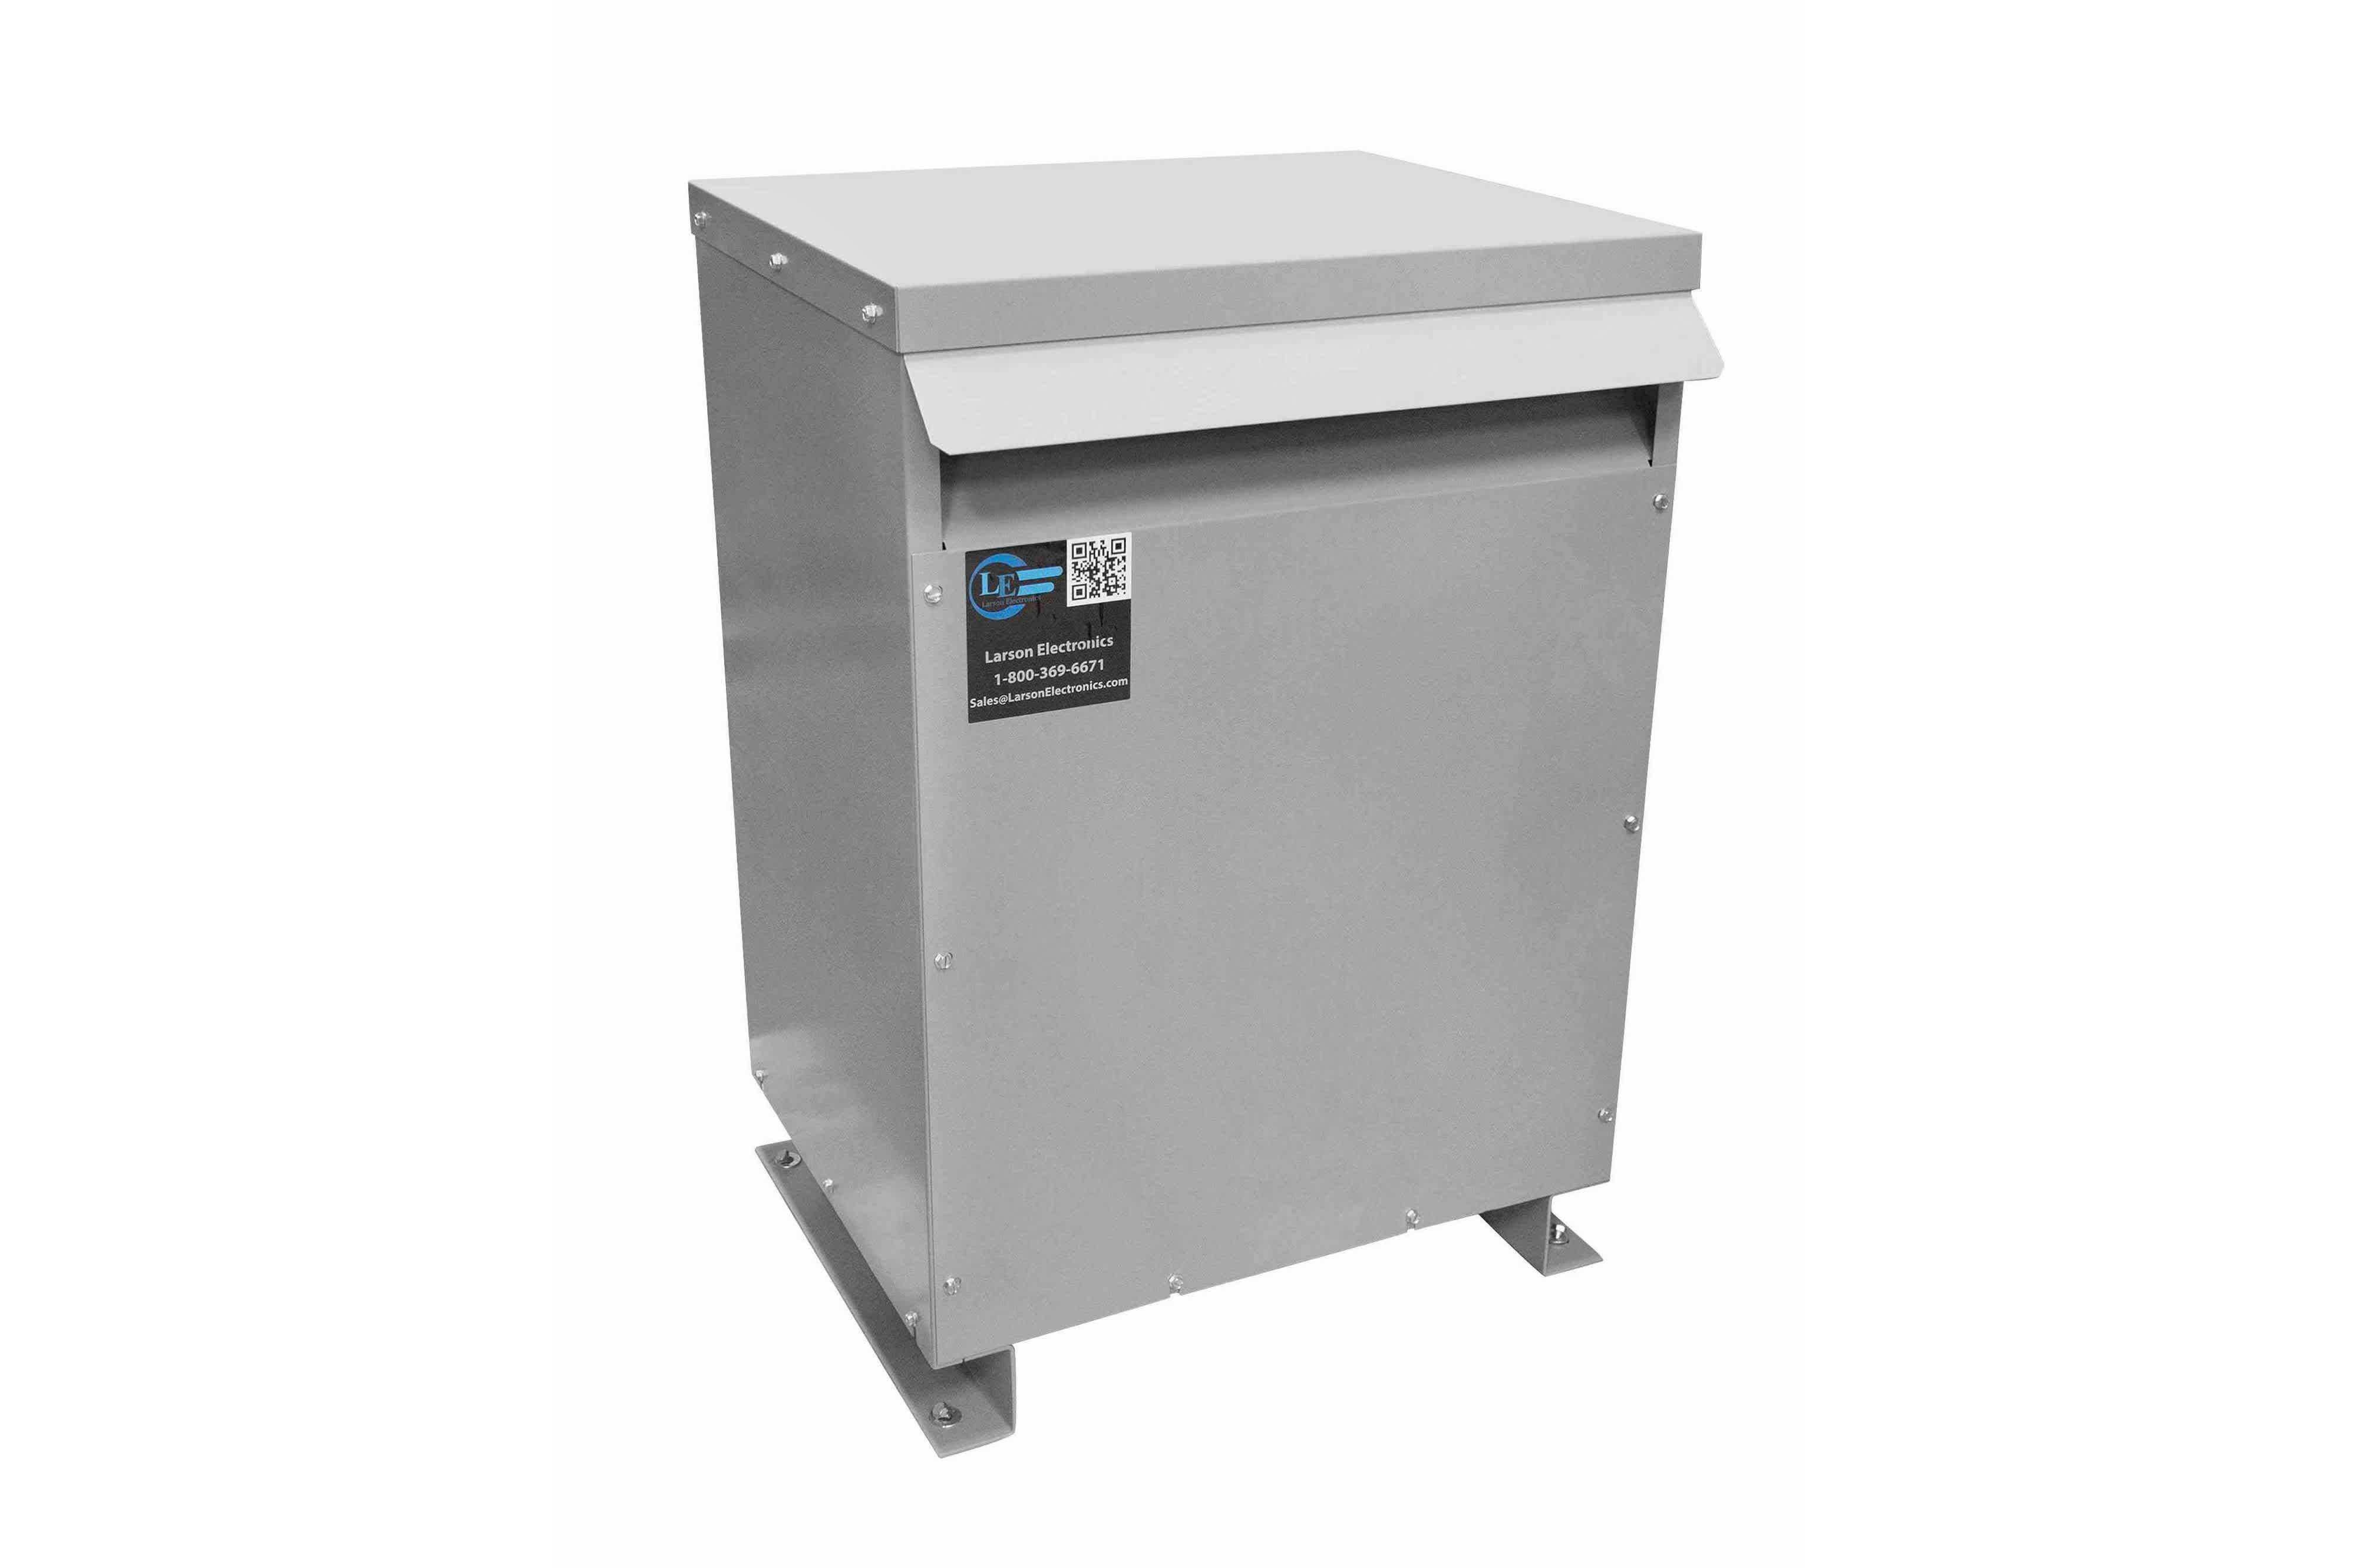 40 kVA 3PH Isolation Transformer, 440V Wye Primary, 208V Delta Secondary, N3R, Ventilated, 60 Hz